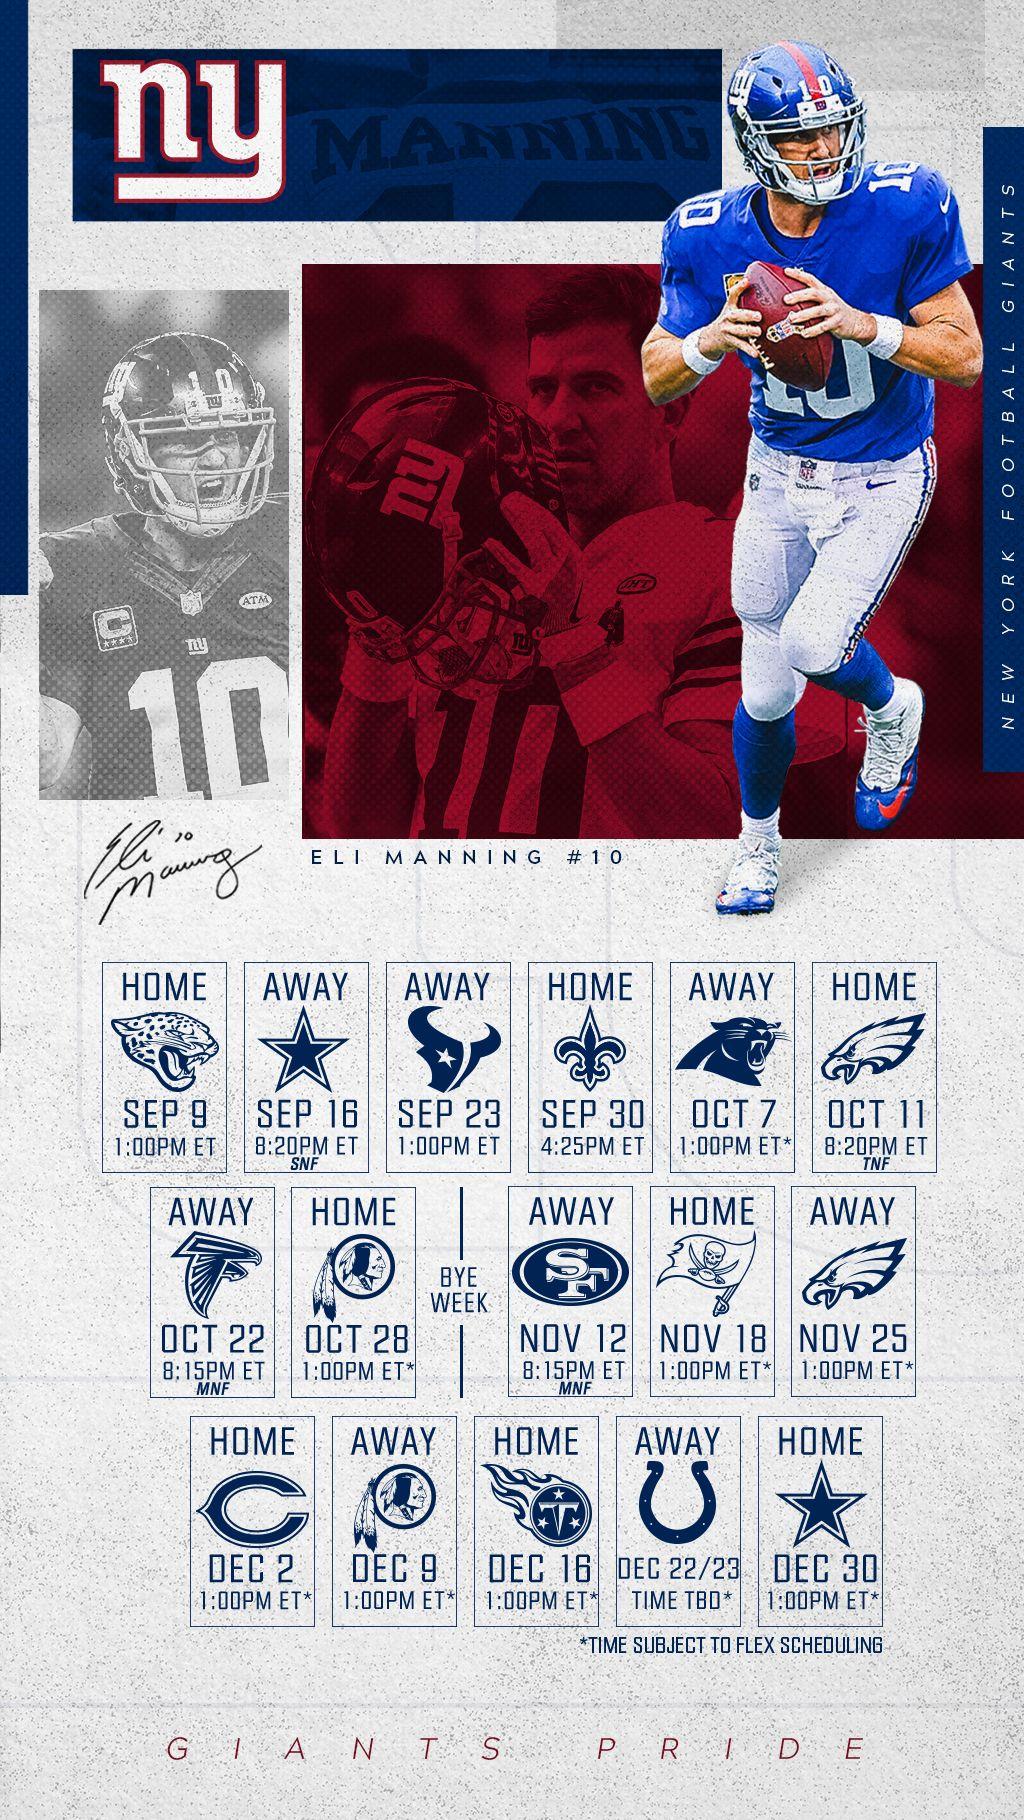 Giants Schedule   New York Giants – Giants.com